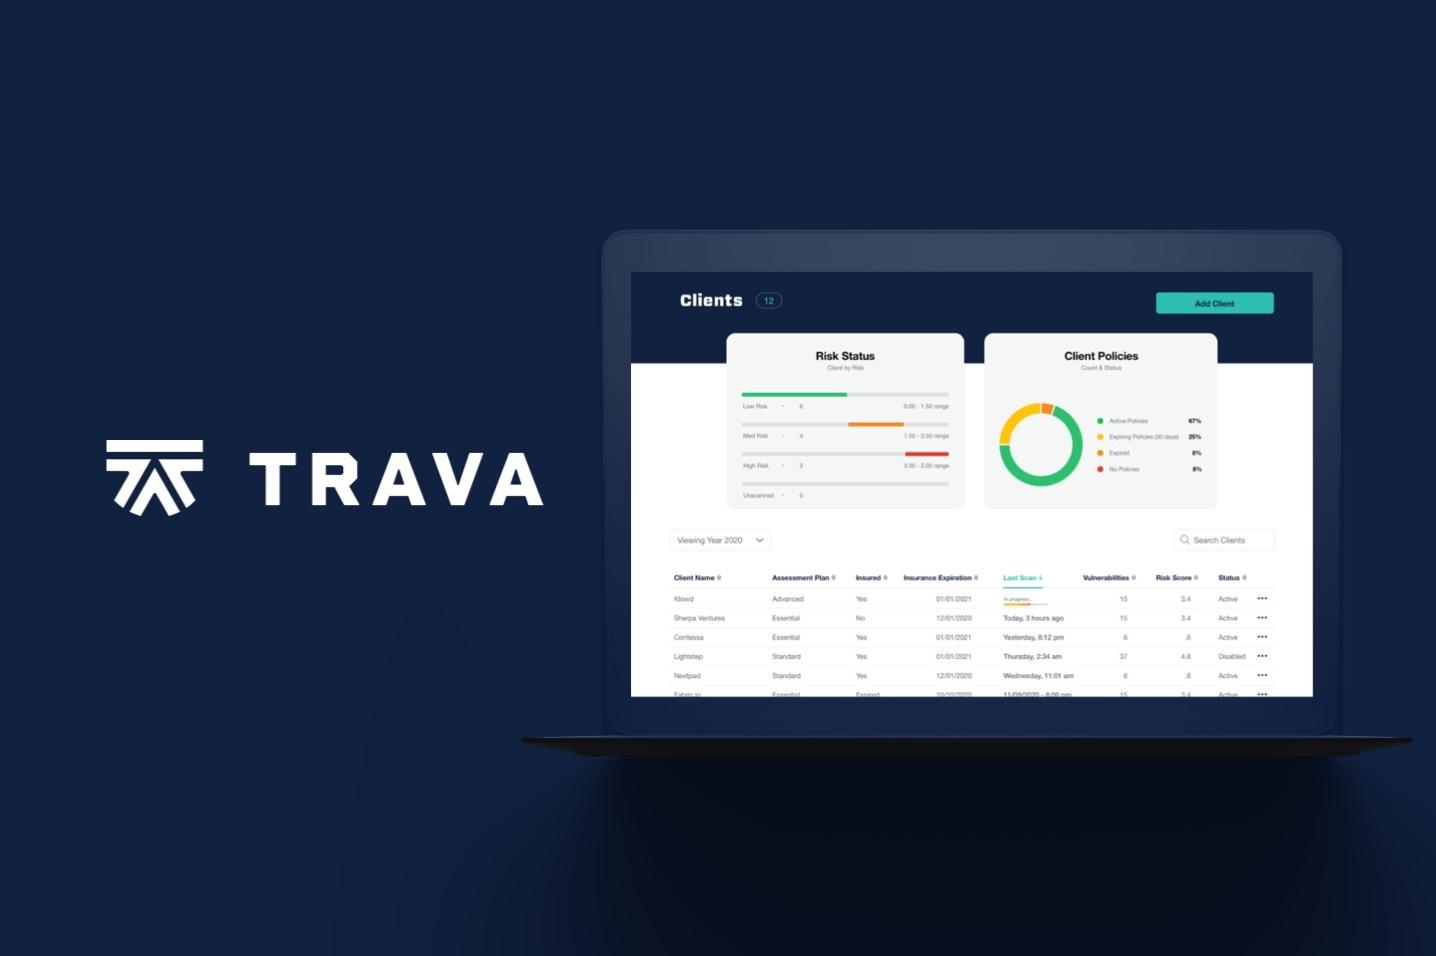 High Alpha Launches Trava, Integrated Cyber Risk Management Platform